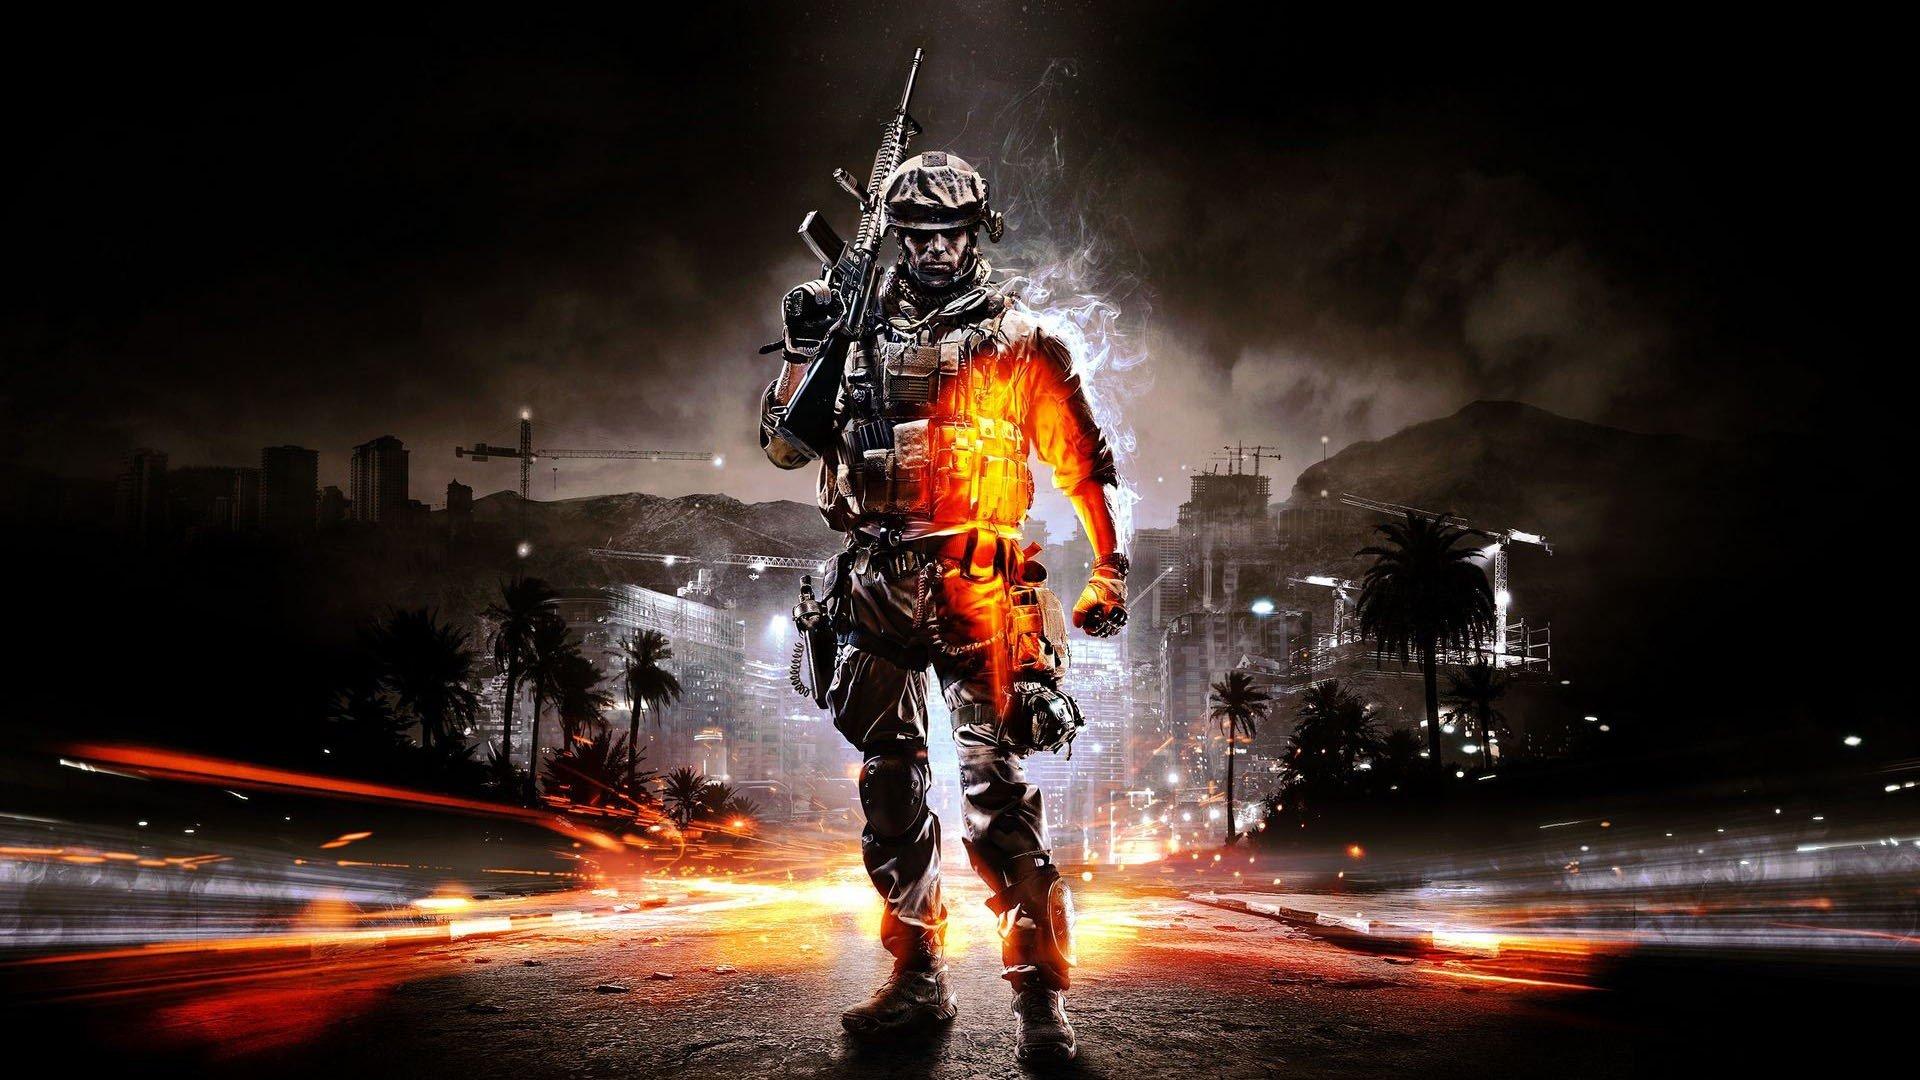 Cool Wallpaper Gaming Battlefield - 32af5bb5e20e51efc42fa9b17ad98b8a  Image_918485 .jpg